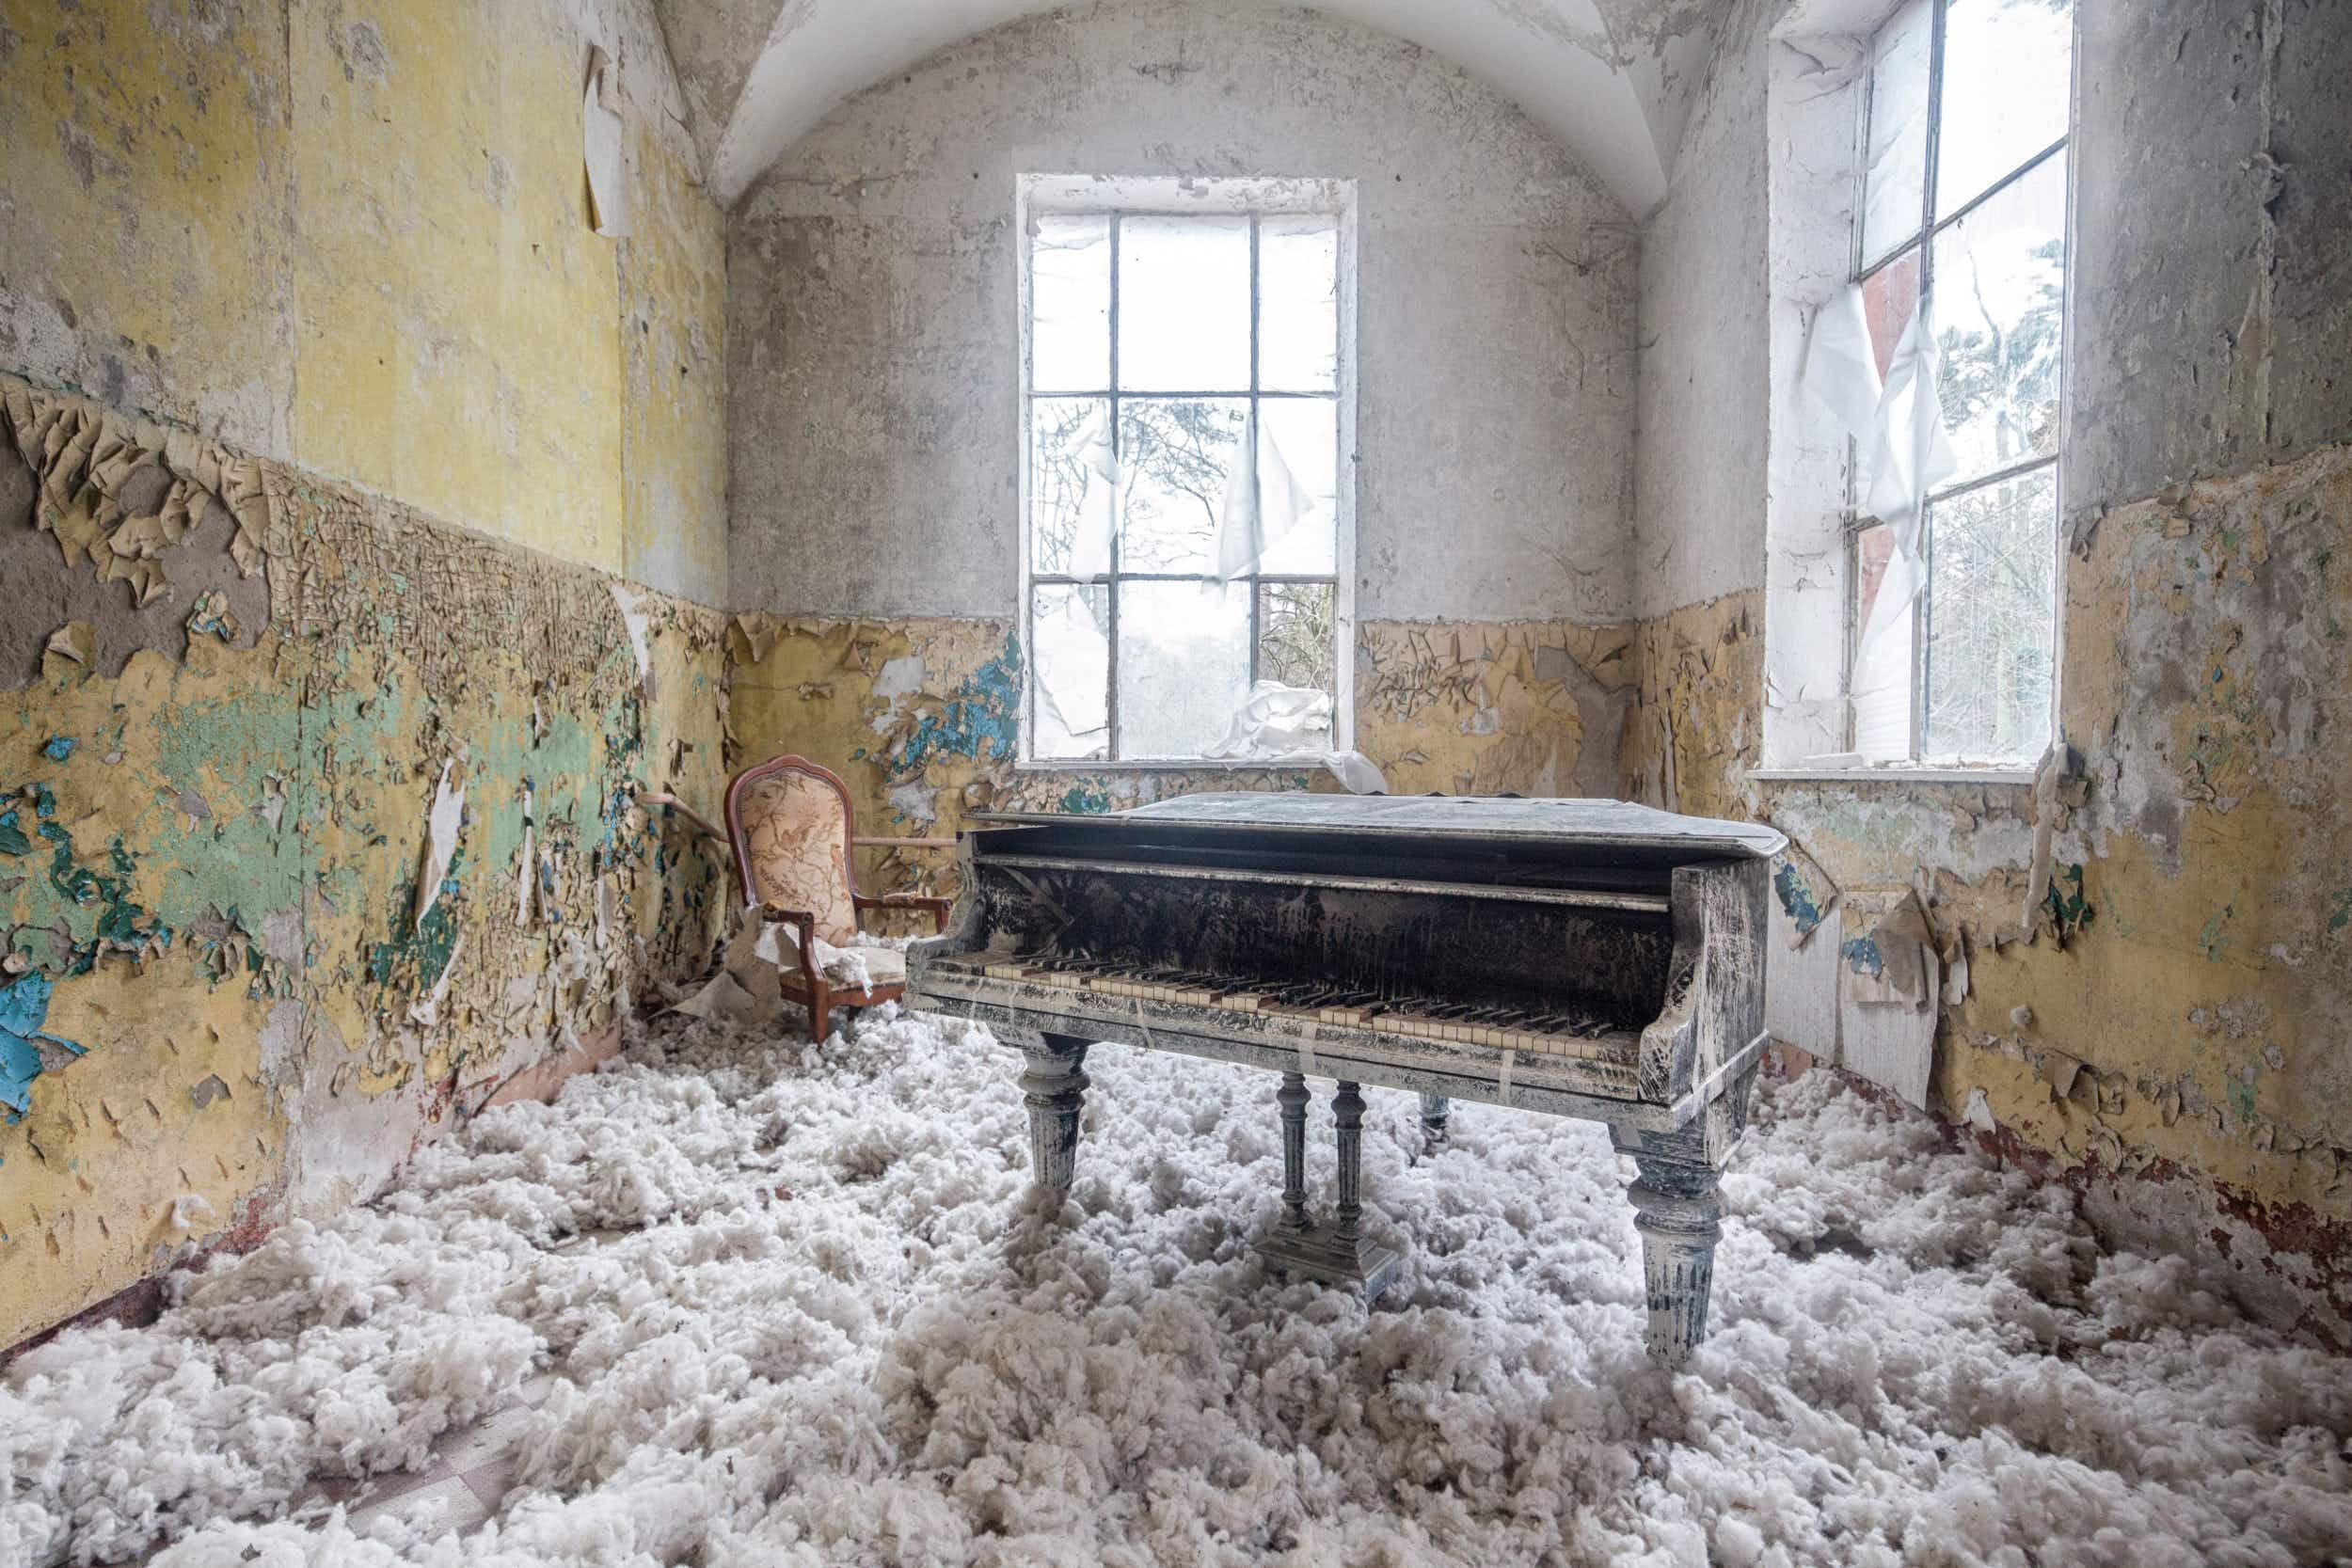 Requiem for pianos: photographer captures Europe's abandoned instruments